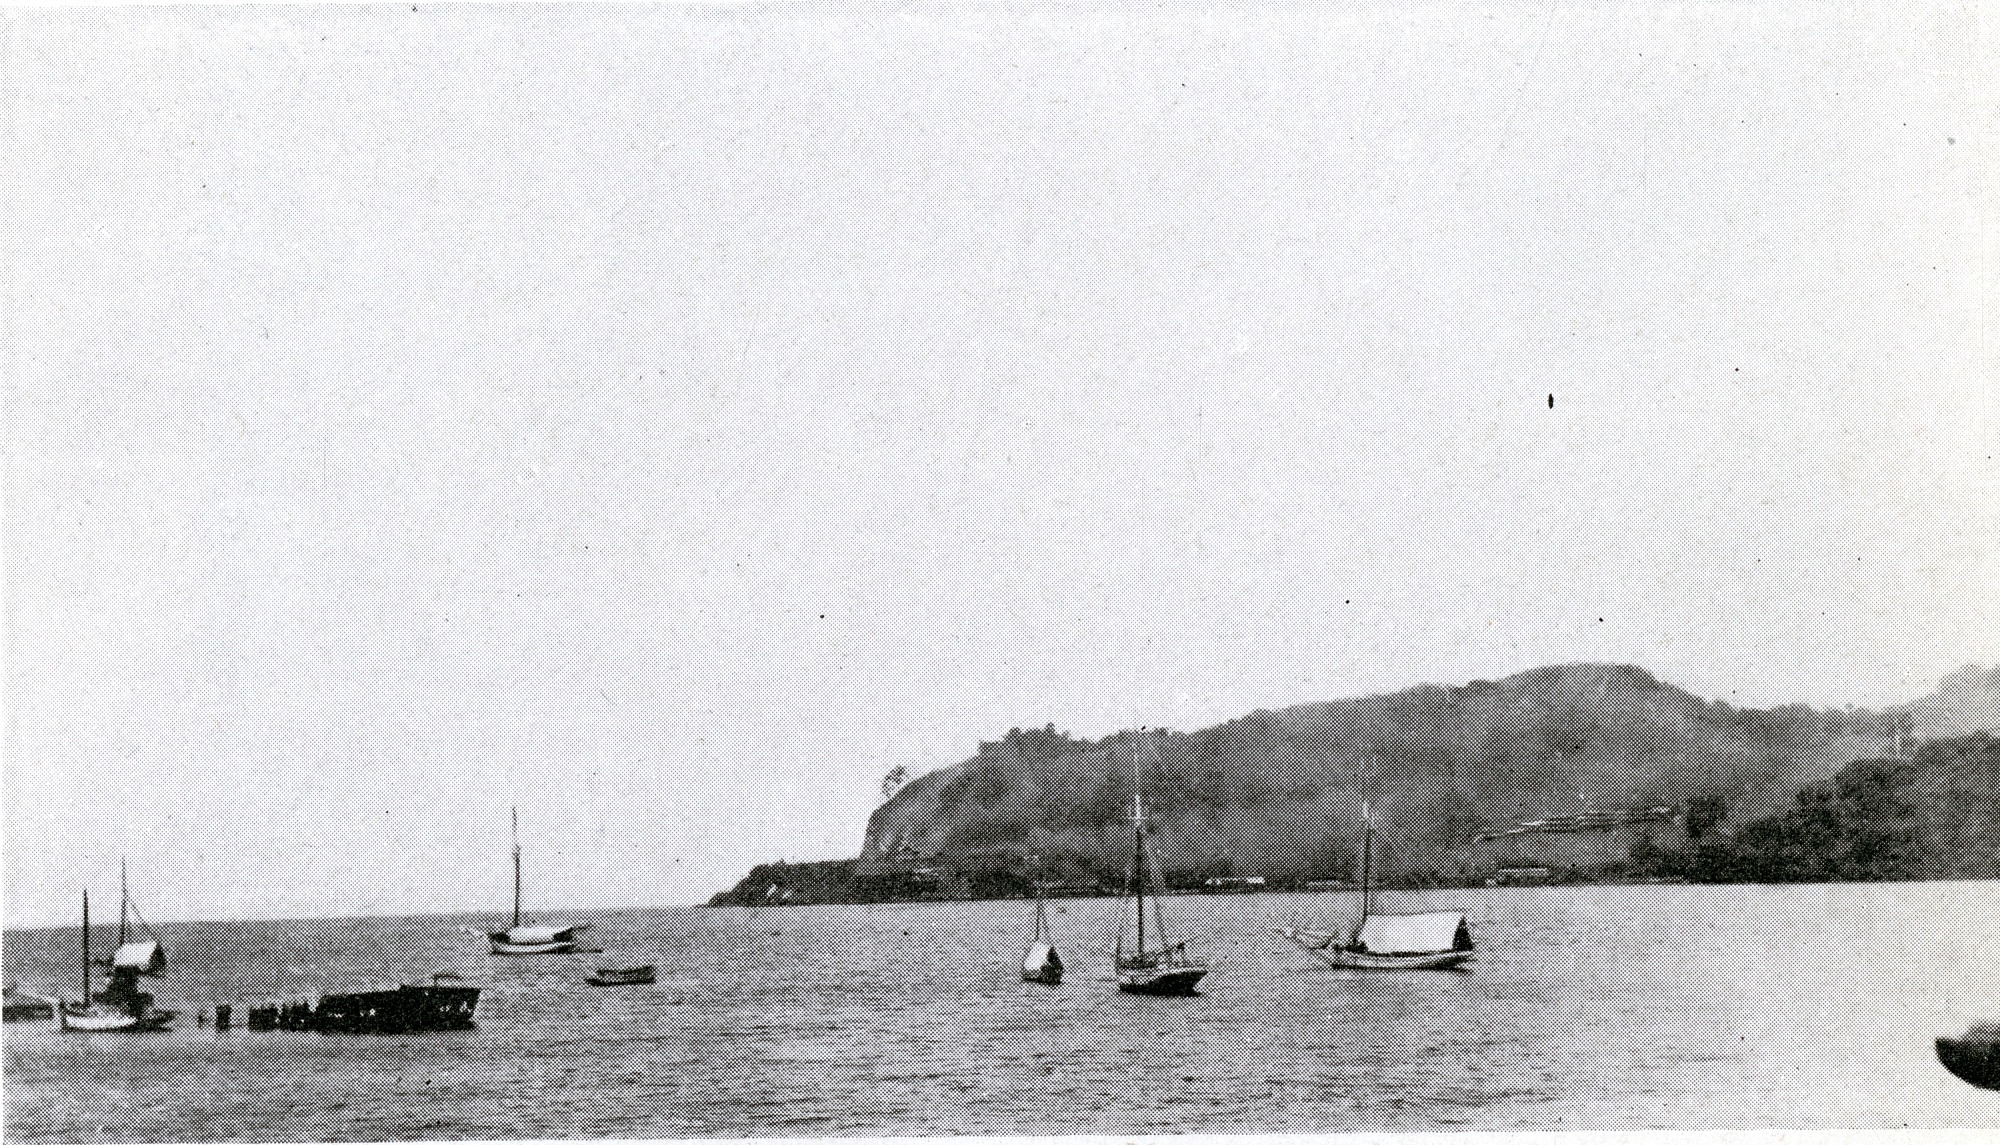 Porto Bello Bay, Panama